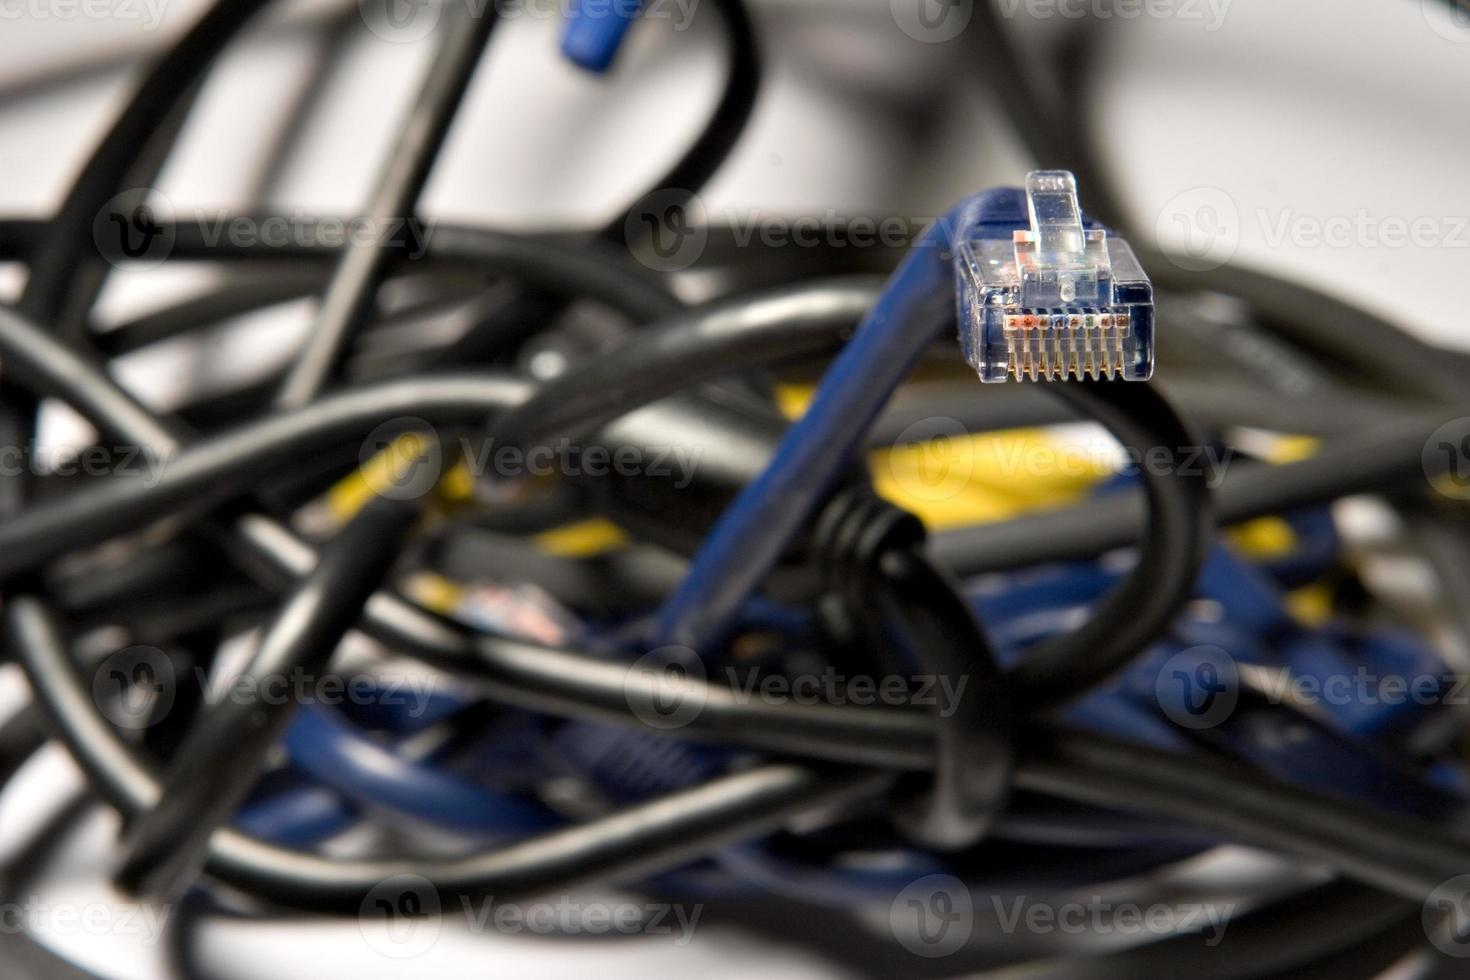 câble ethernet (4) photo